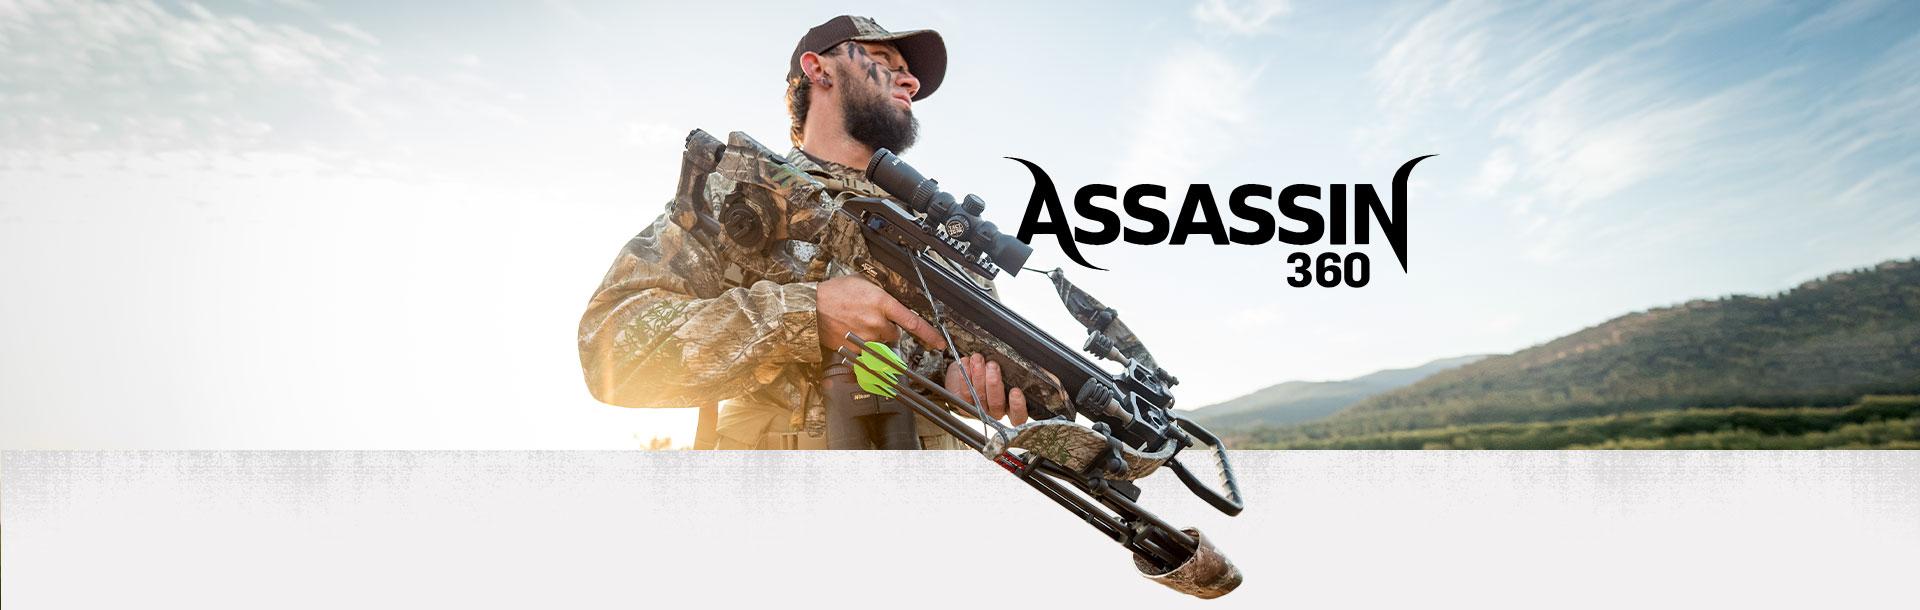 Excalibur Assassin 360 crossbow in camo